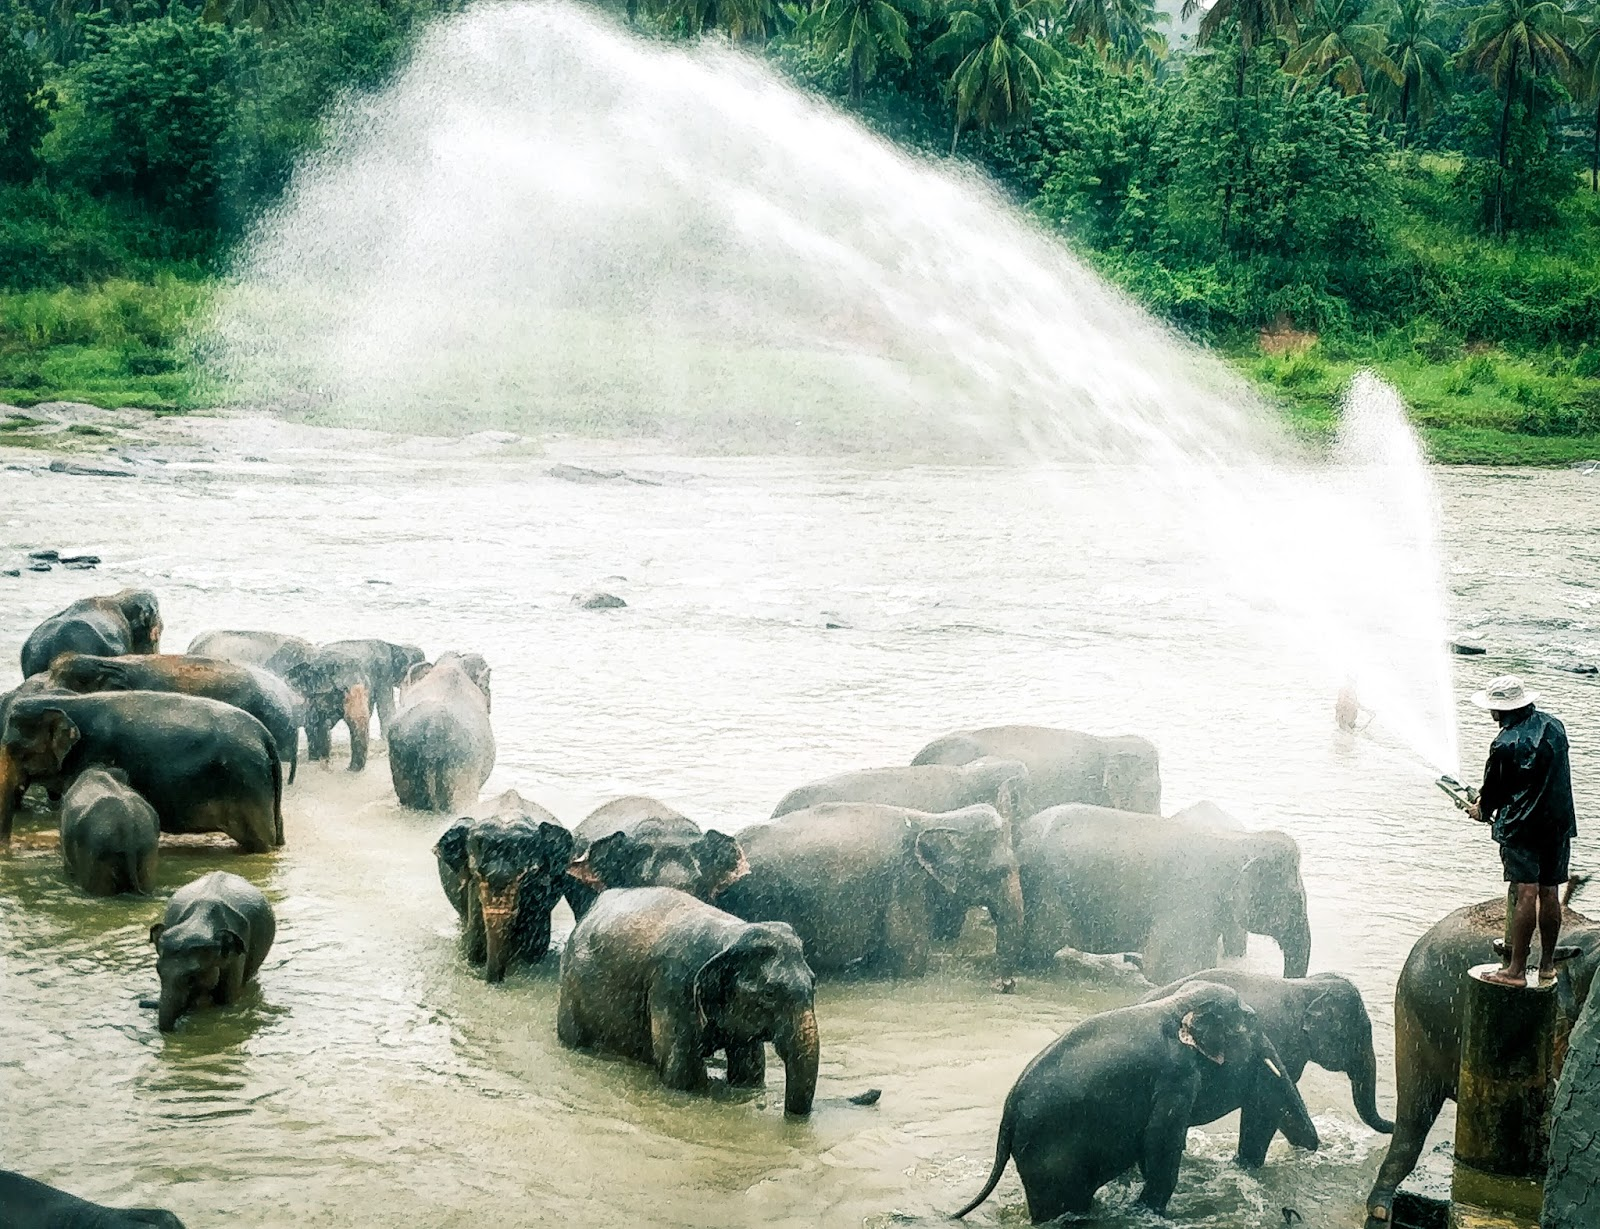 Elephants having a bath at the Pinnawala Elephant Orphanage, Sri Lanka